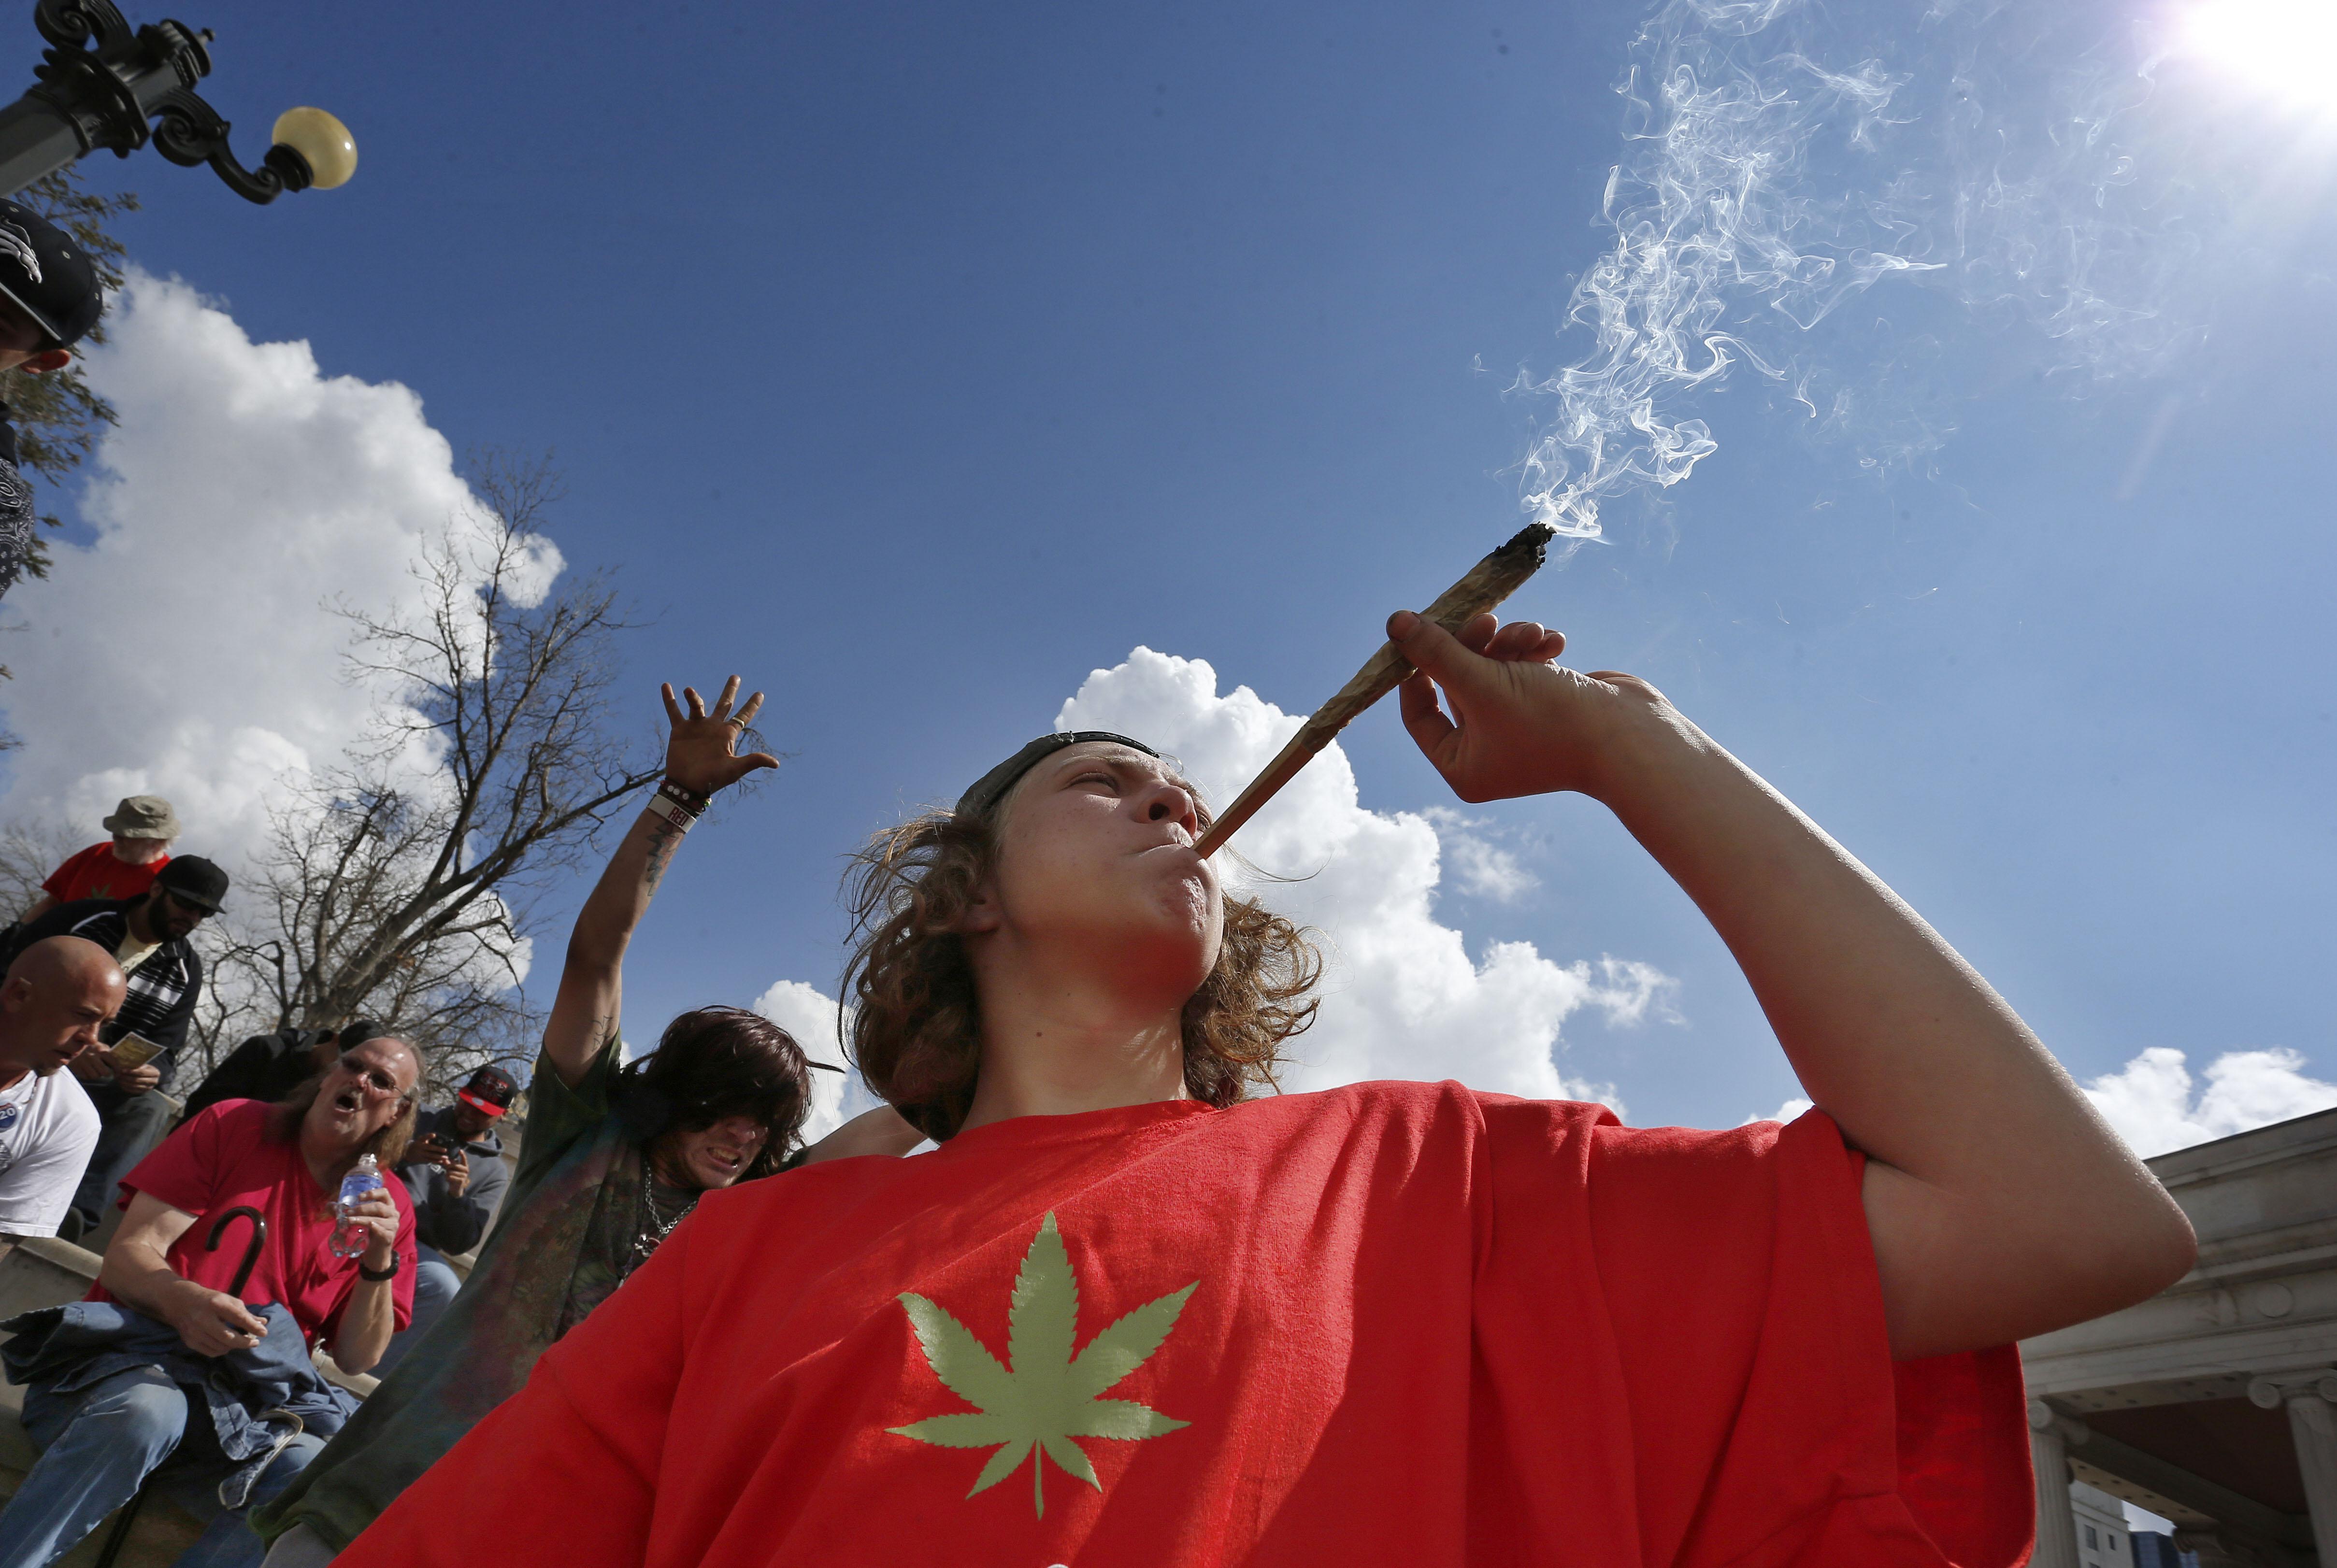 Photo: Smoking marijuana at 4/20 festival in Denver